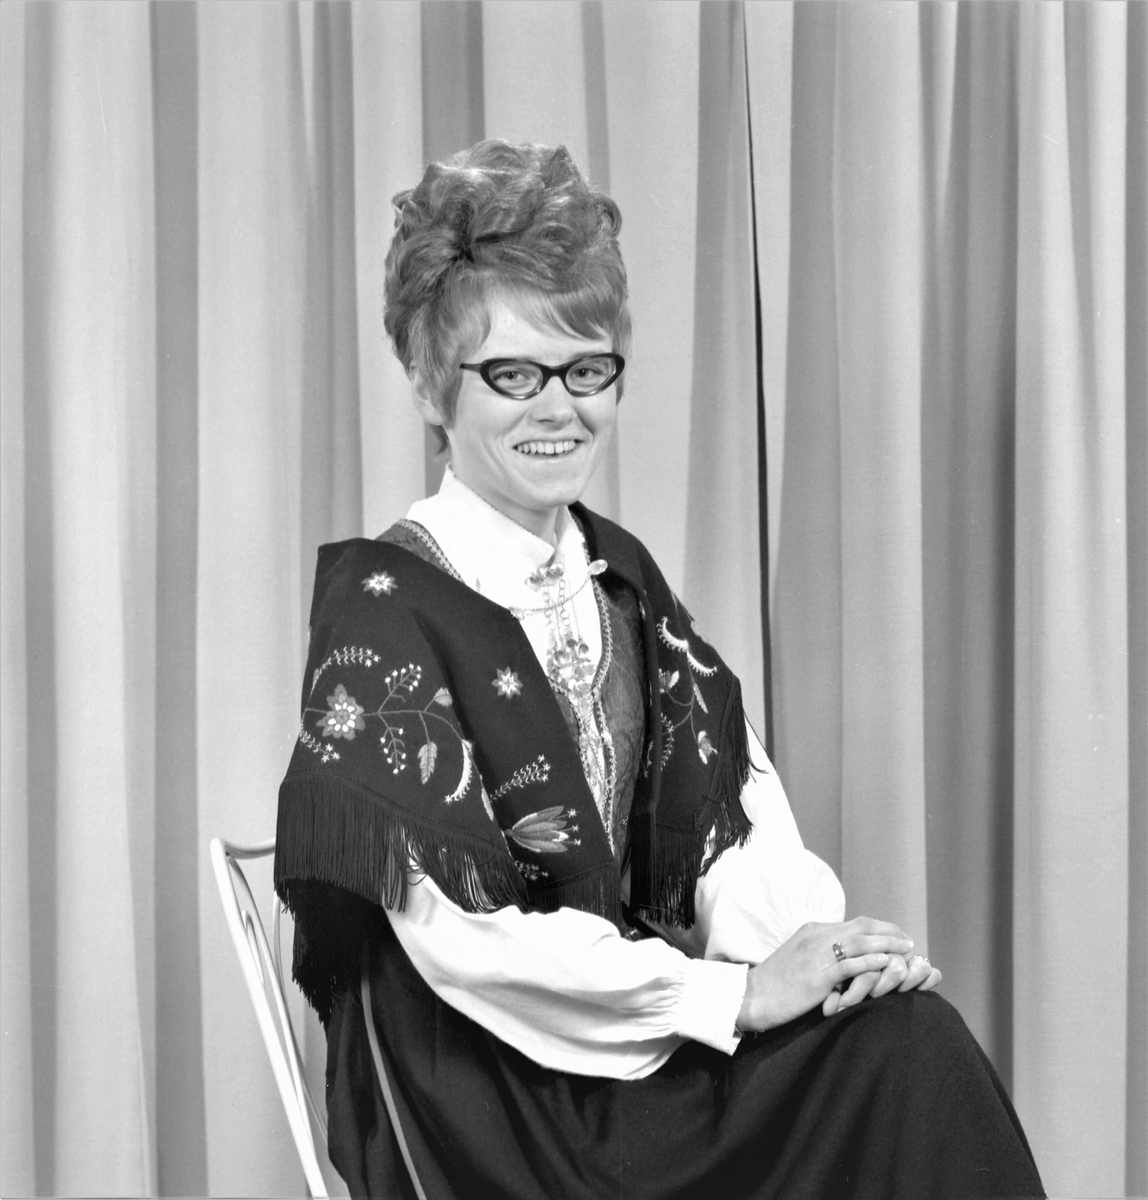 Portrett. Ung kvinne i bunad med briller. Bestilt av Hildbjørg Haugen. Skudeneshavn